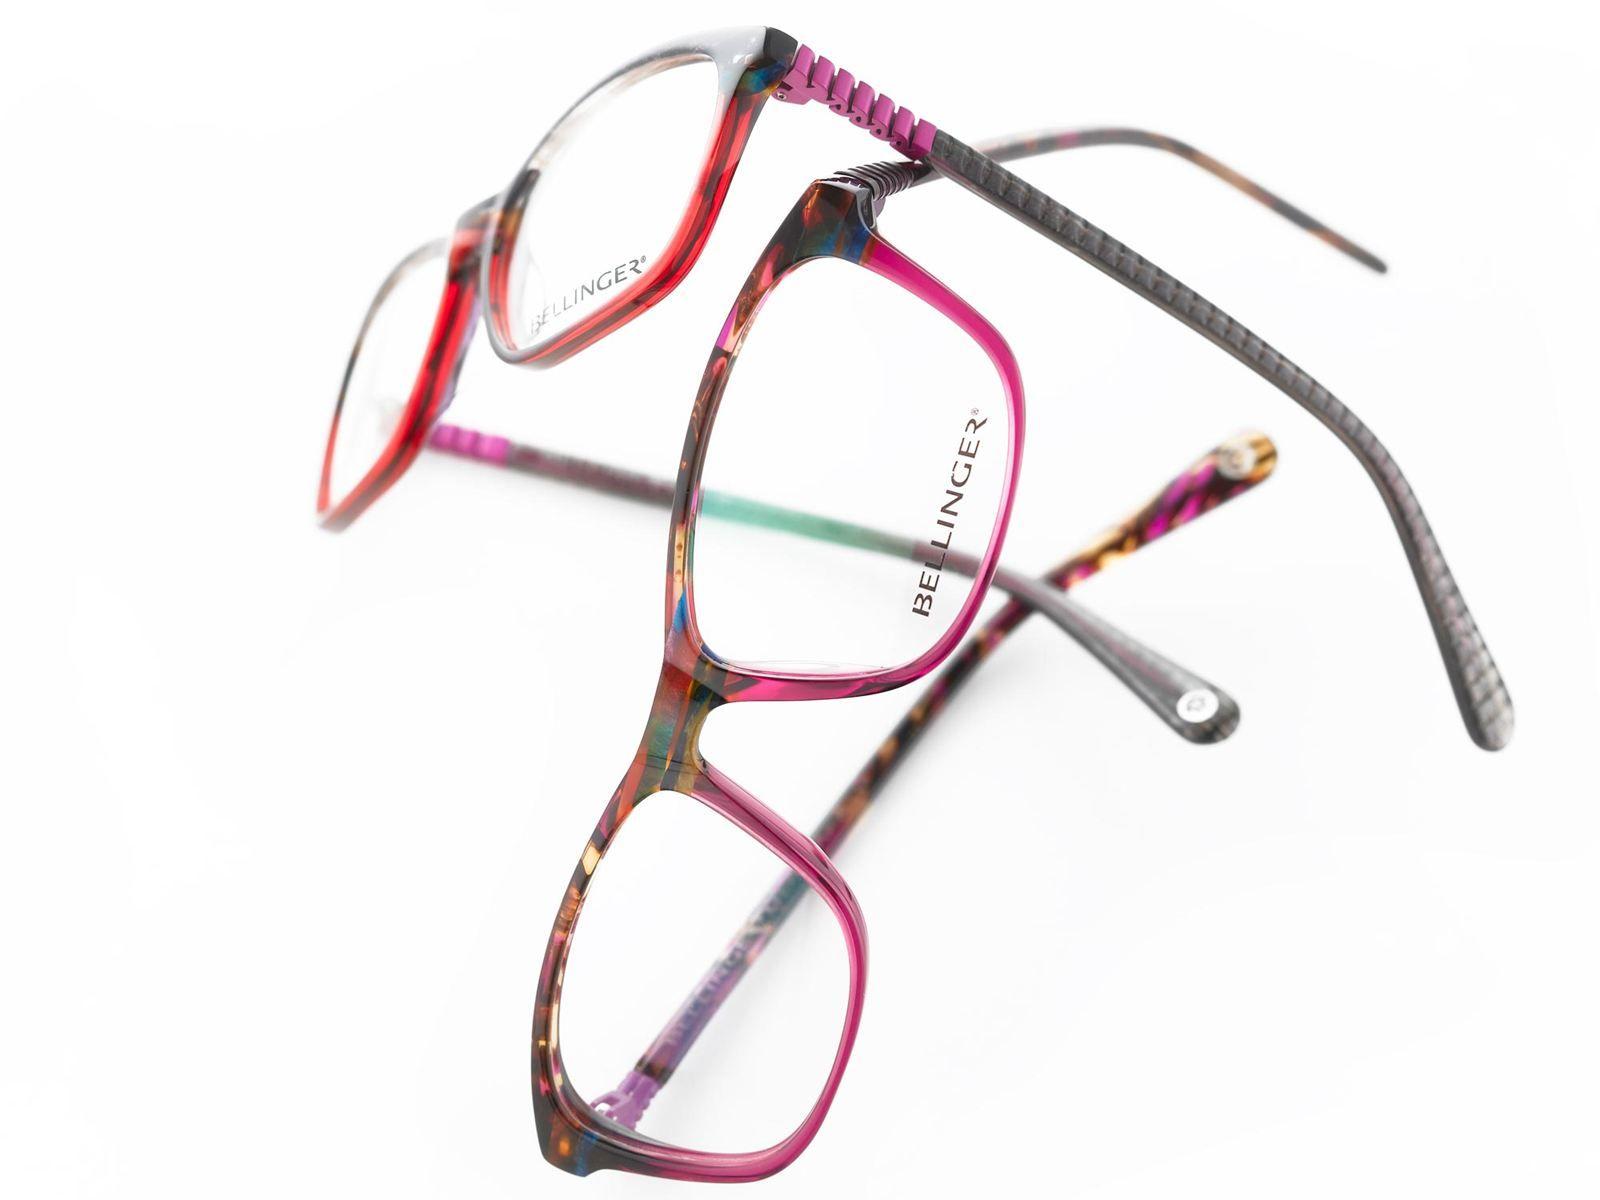 fd78616cf098 Bellinger - High quality danish designer eyewear